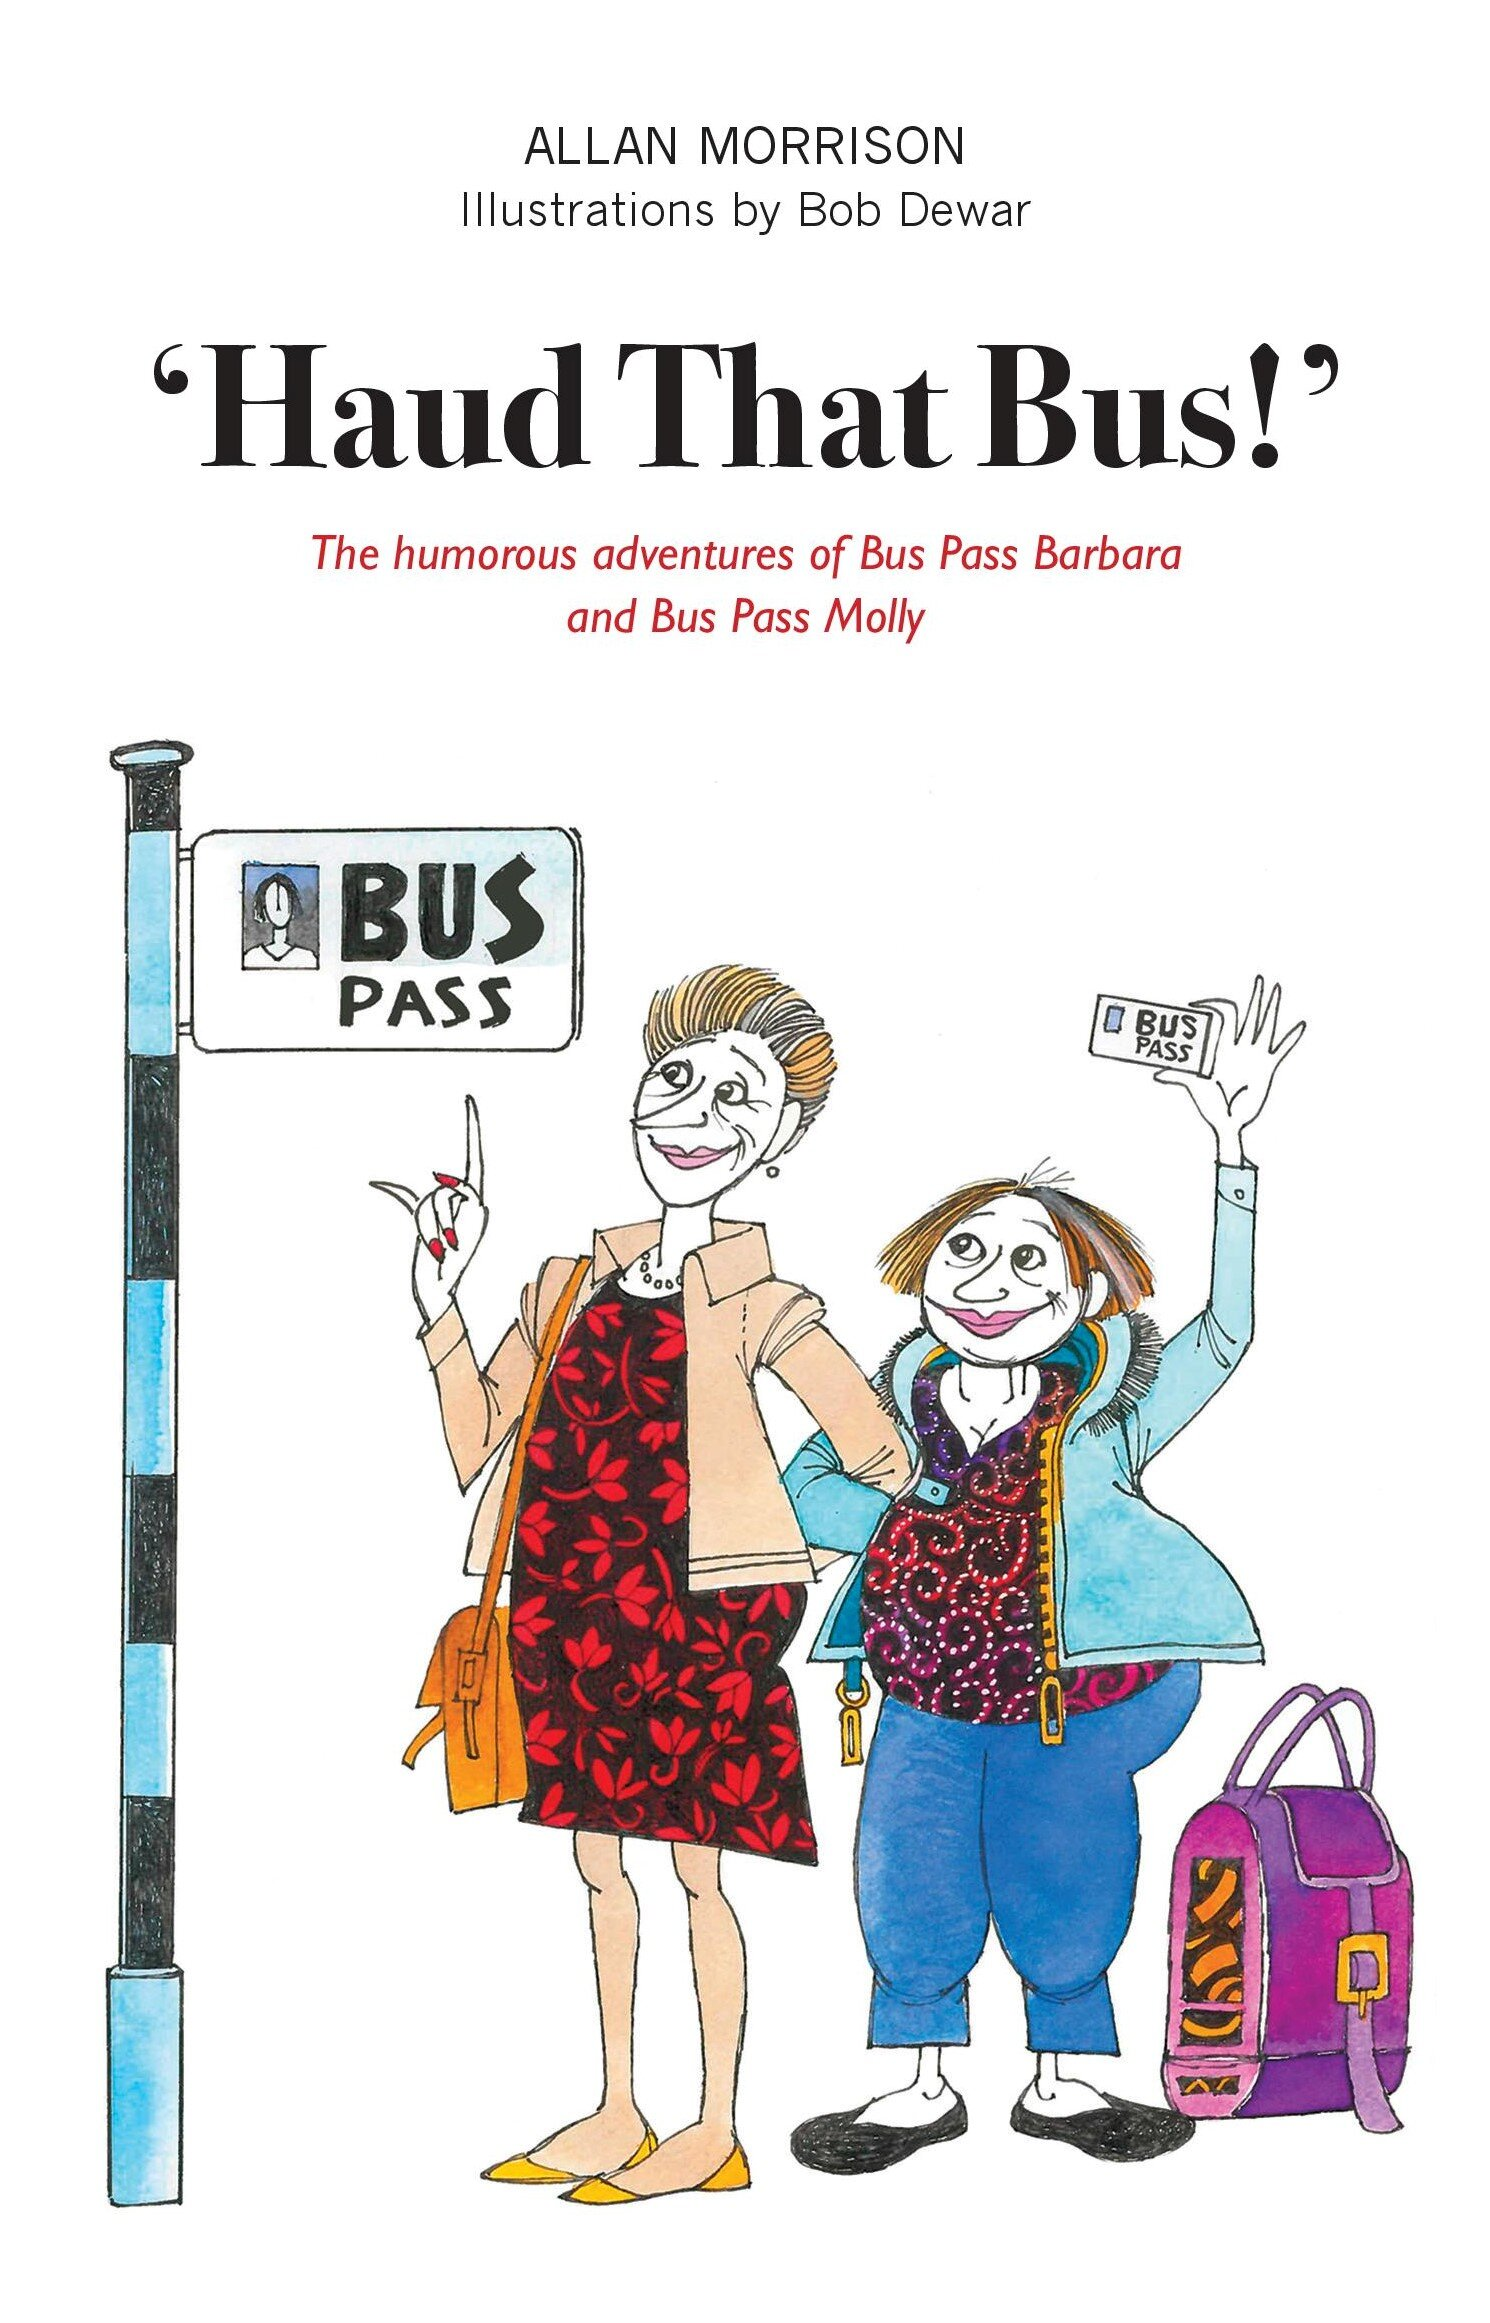 'Haud That Bus!' Allan Morrison 9781912147571 Luath Press.jpg